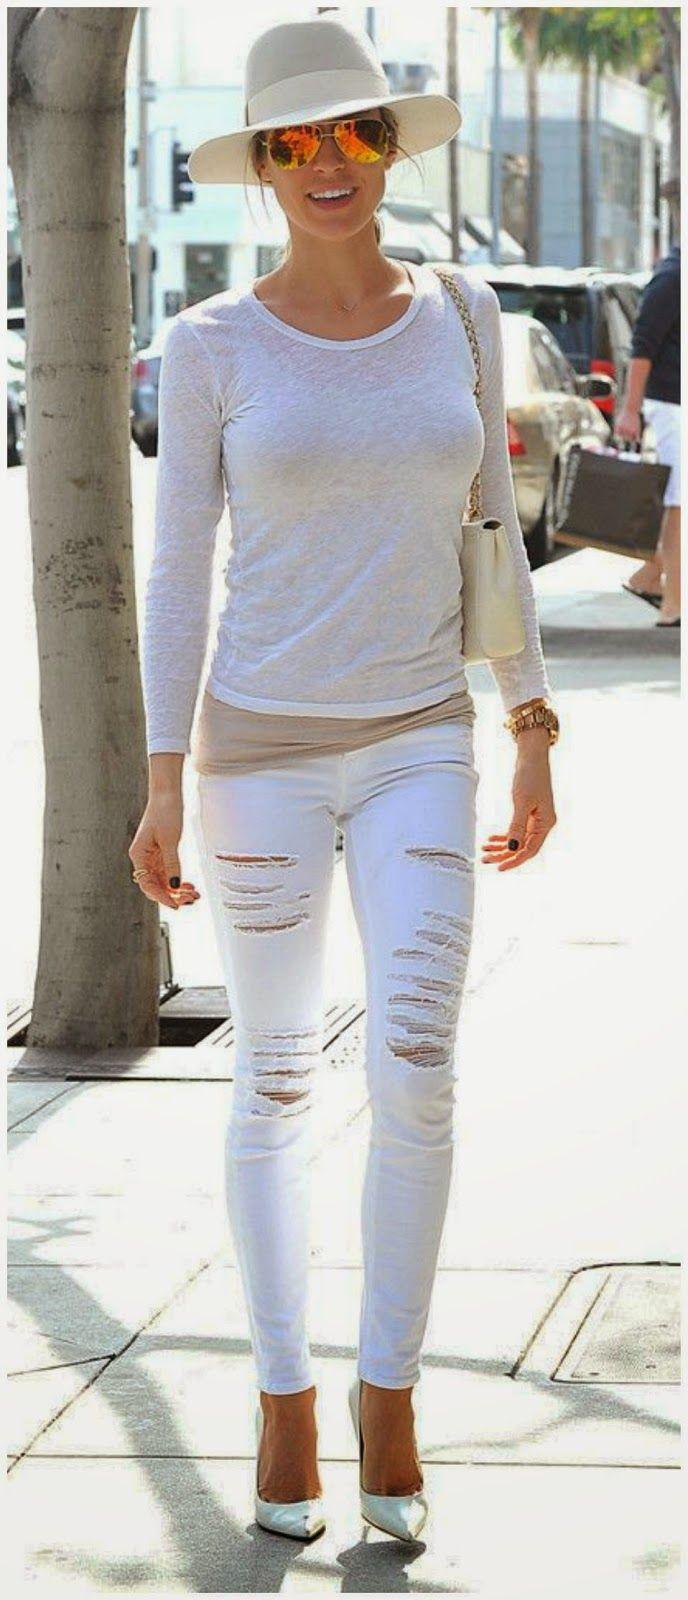 Kristin Cavallari - celebrity street style in all white in Los Angeles March 2015